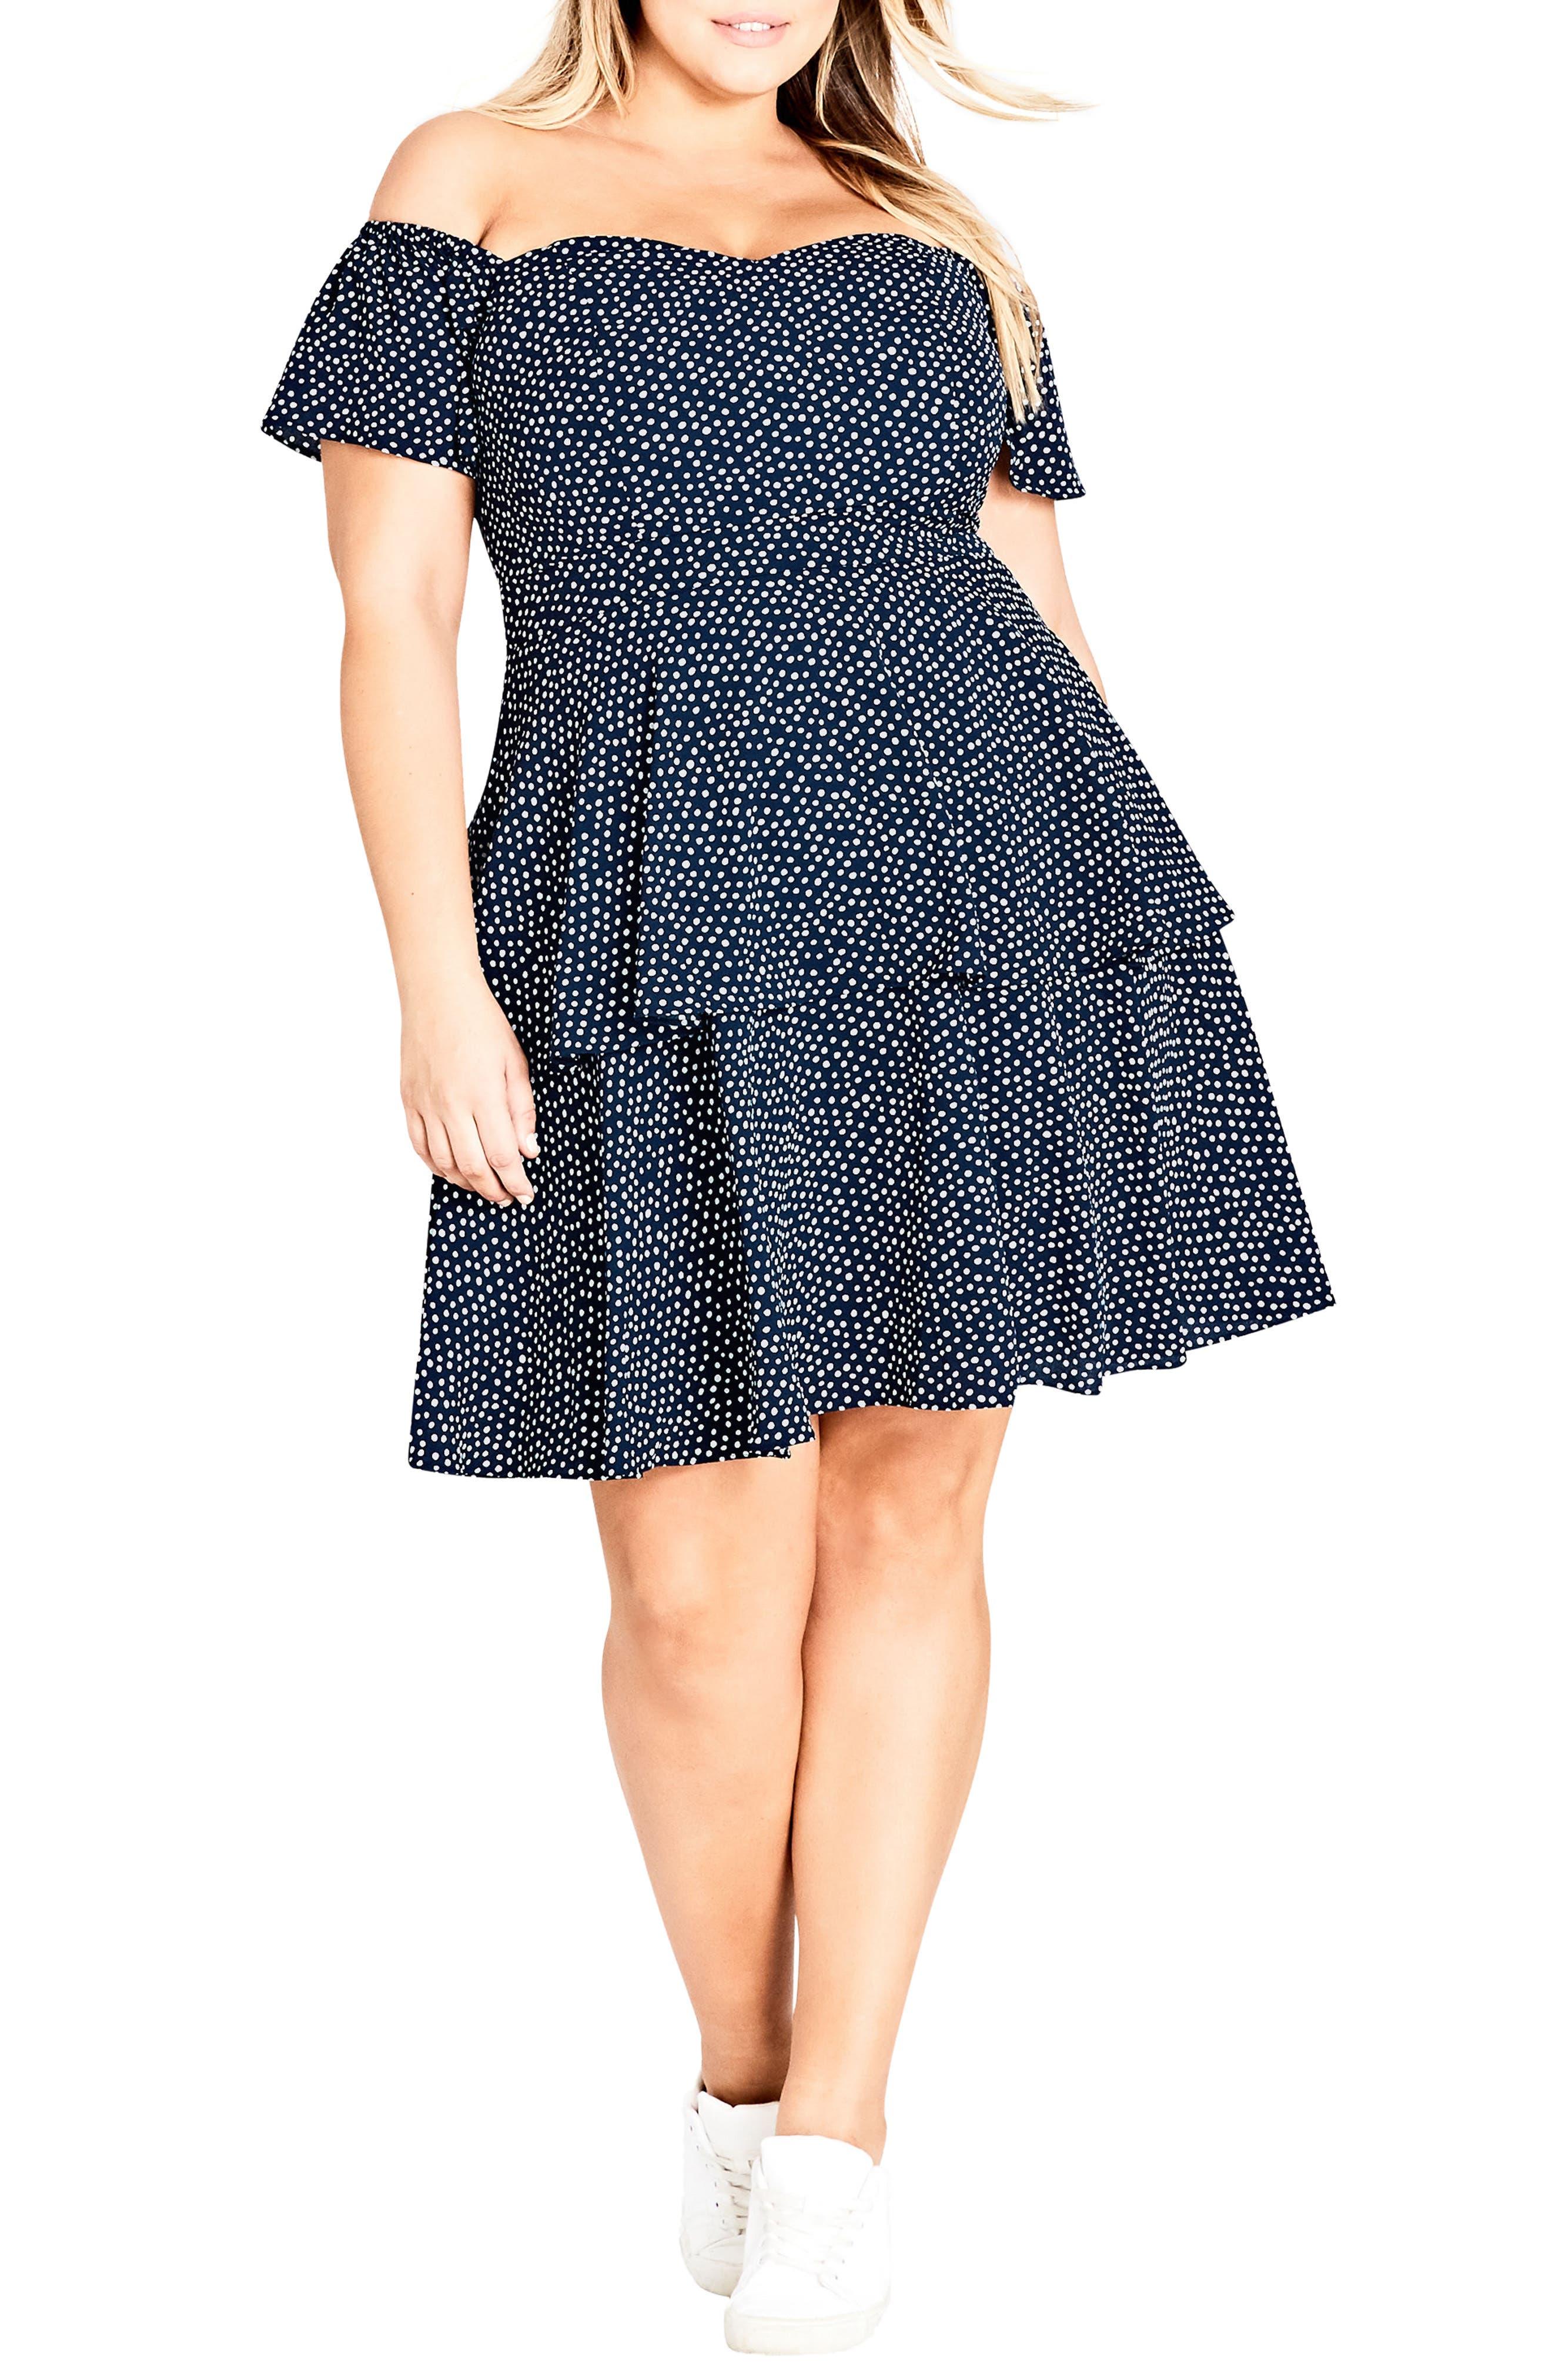 Spot Off the Shoulder Dress,                         Main,                         color, Navy Spot